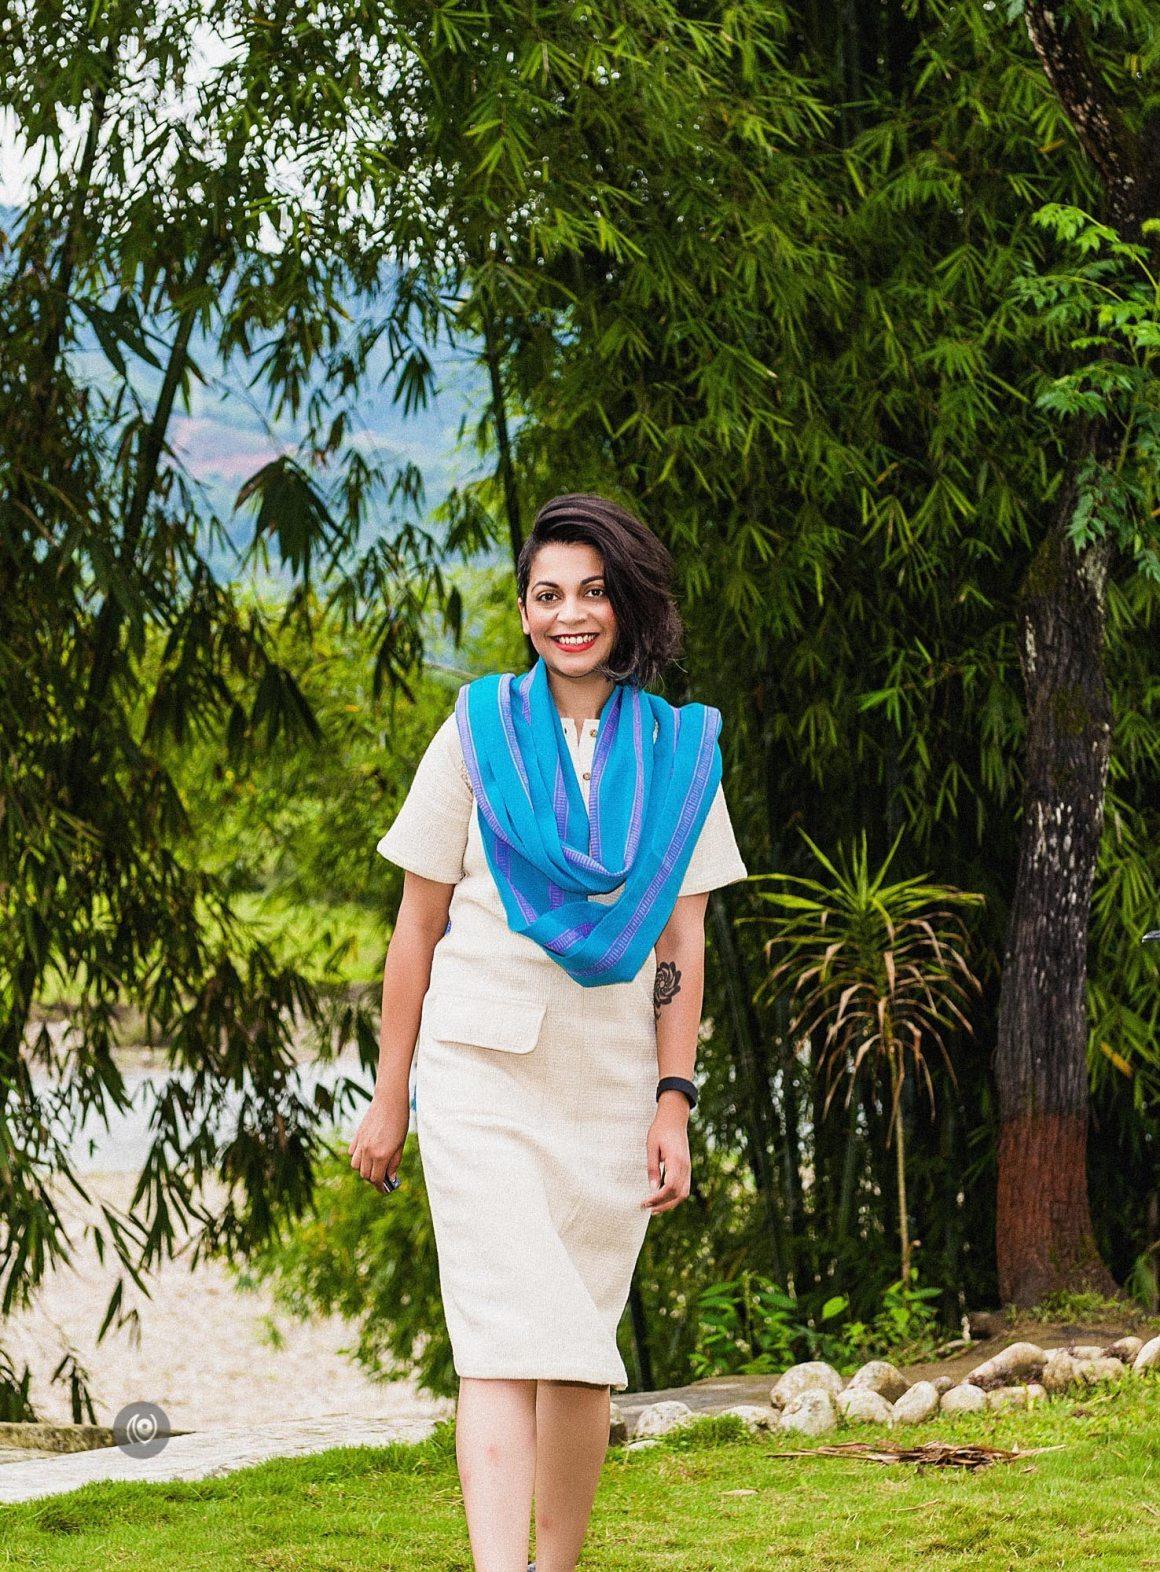 #CoverUp 75, #EyesForArunachal, Naina.co, Luxury Photographer, Lifestyle Photographer, Travel Photographer, Fashion Photographer, Naina Redhu, #EyesForDestinations, #EyesForIndia, Destination Photographer, India, Arunachal Pradesh, Menchukha, Aalong, Patum Bridge, Experience Collector, Photo Story, Visual Experience Collector, #CoverUp, WearBias, BIAS, Mridu Mehra, Local Weave, Scarf